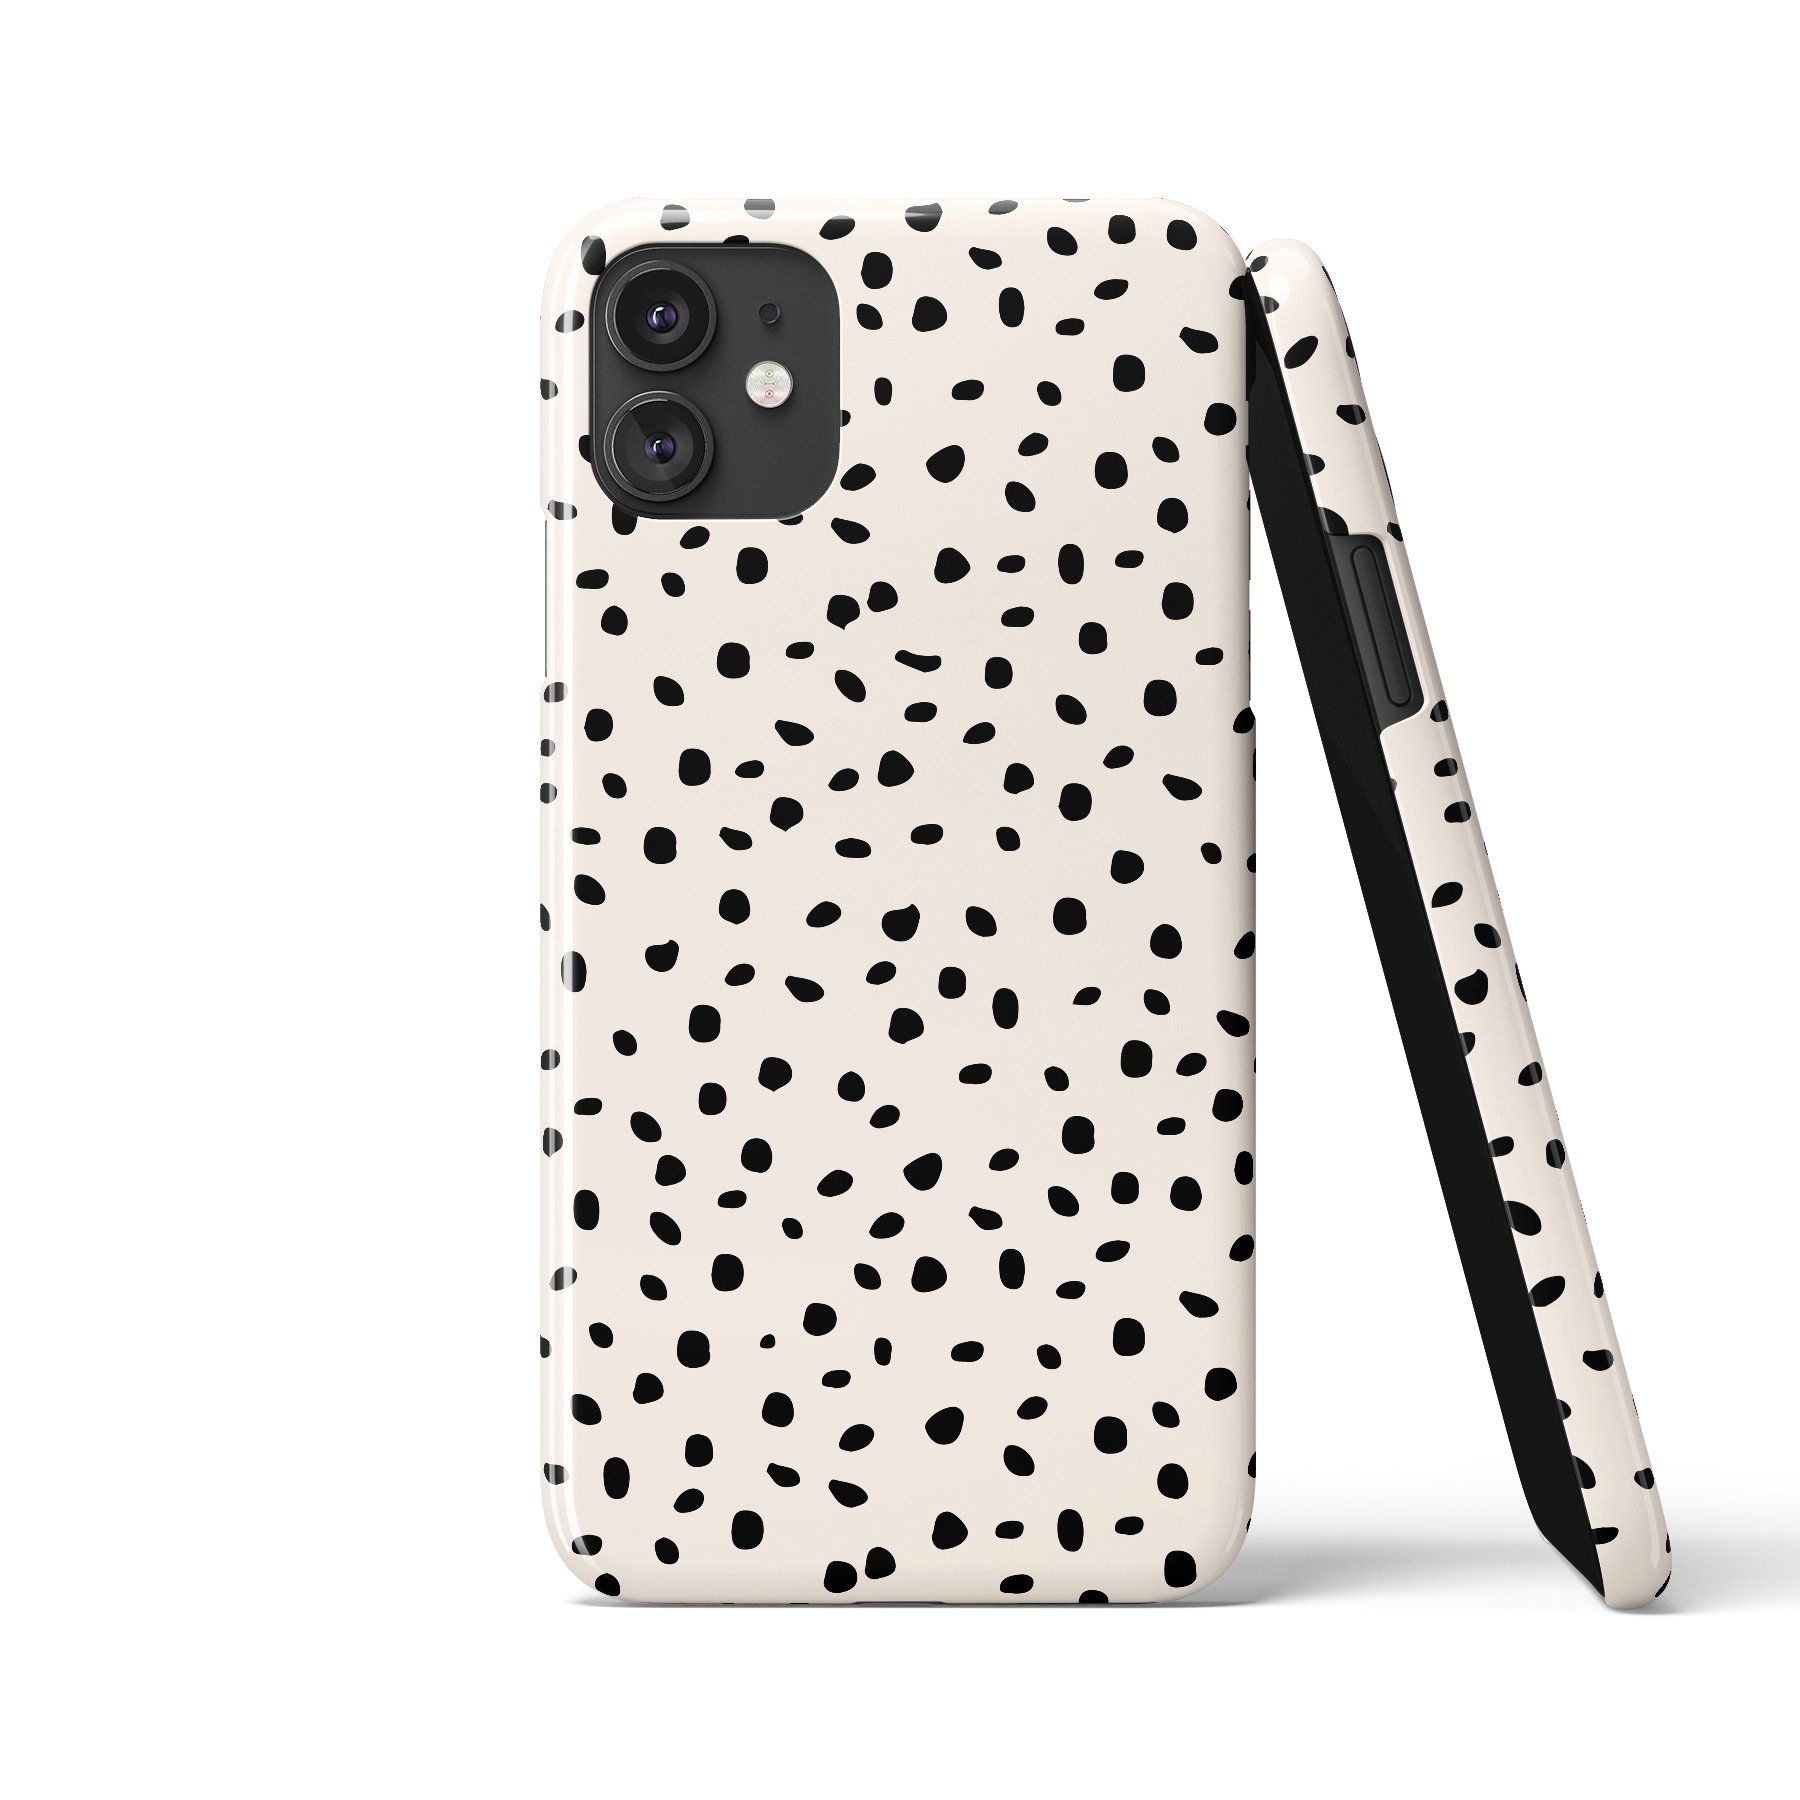 ARA POLKA DOTS White Phone Case - Samsung S10 Plus / Snap Case - Gloss